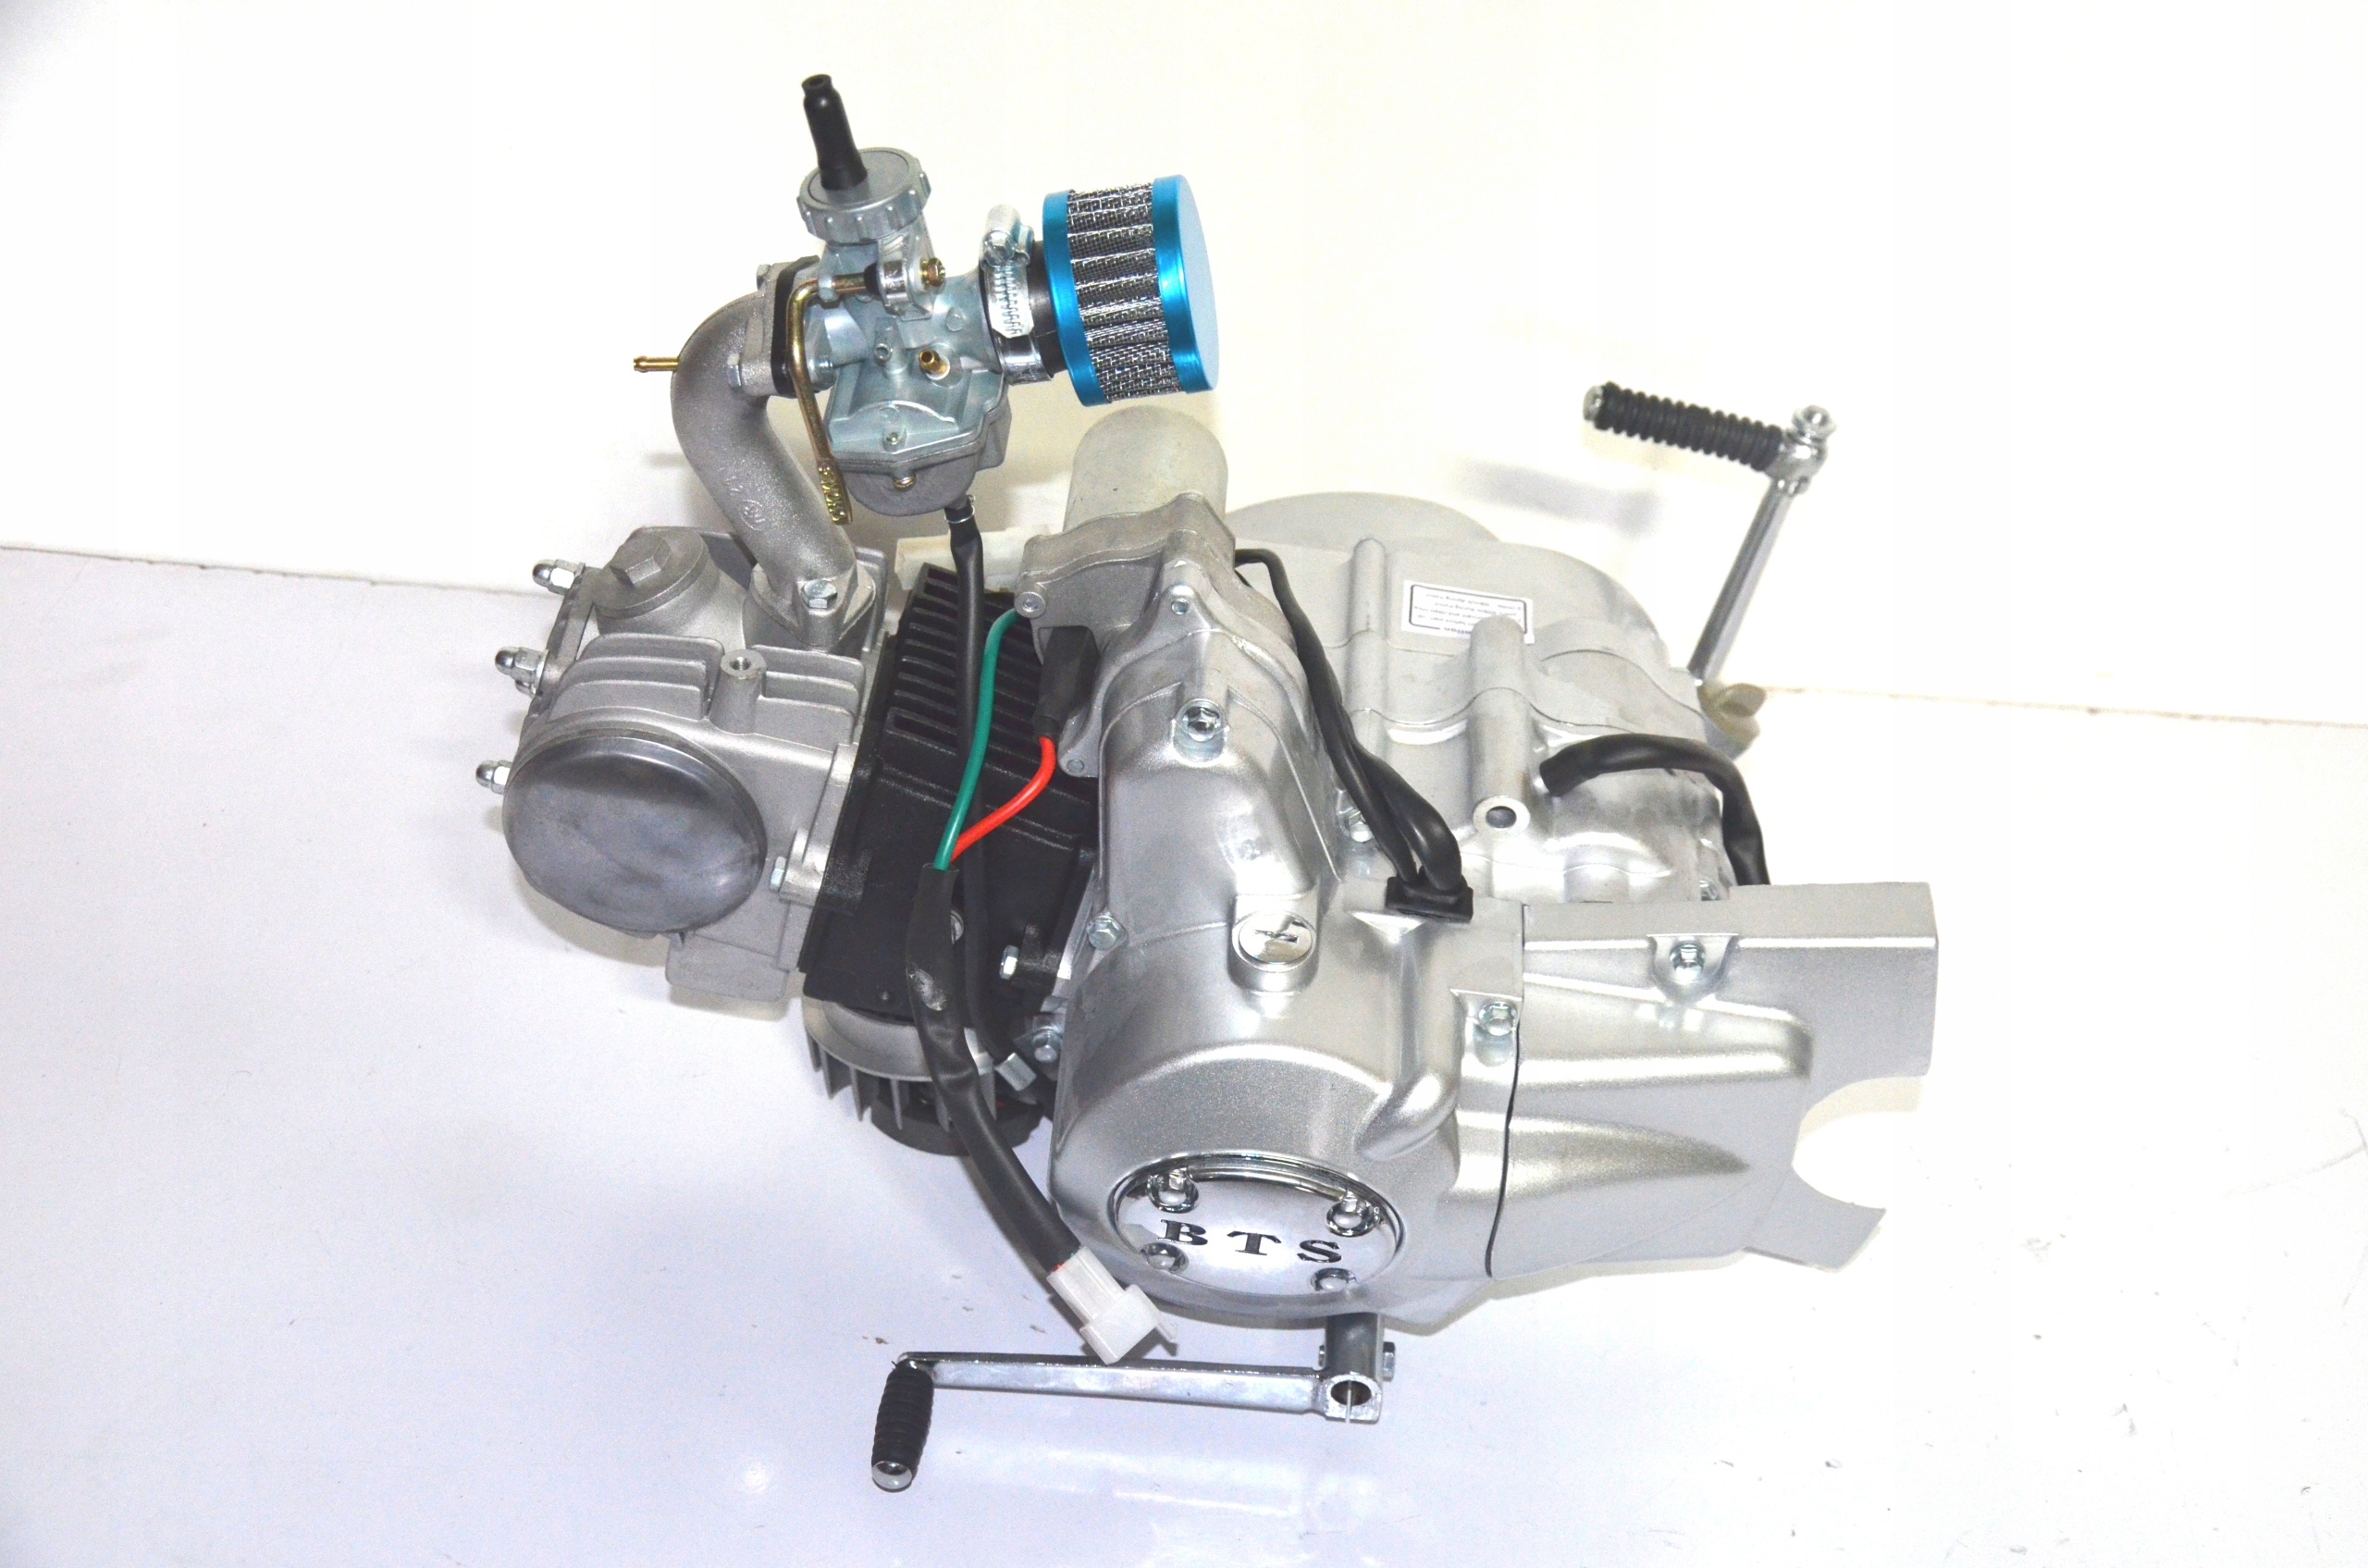 Silnik 125 Bts Router Ws50 Junak 901 Pro50 139fmb Sokolow Podlaski Allegro Pl